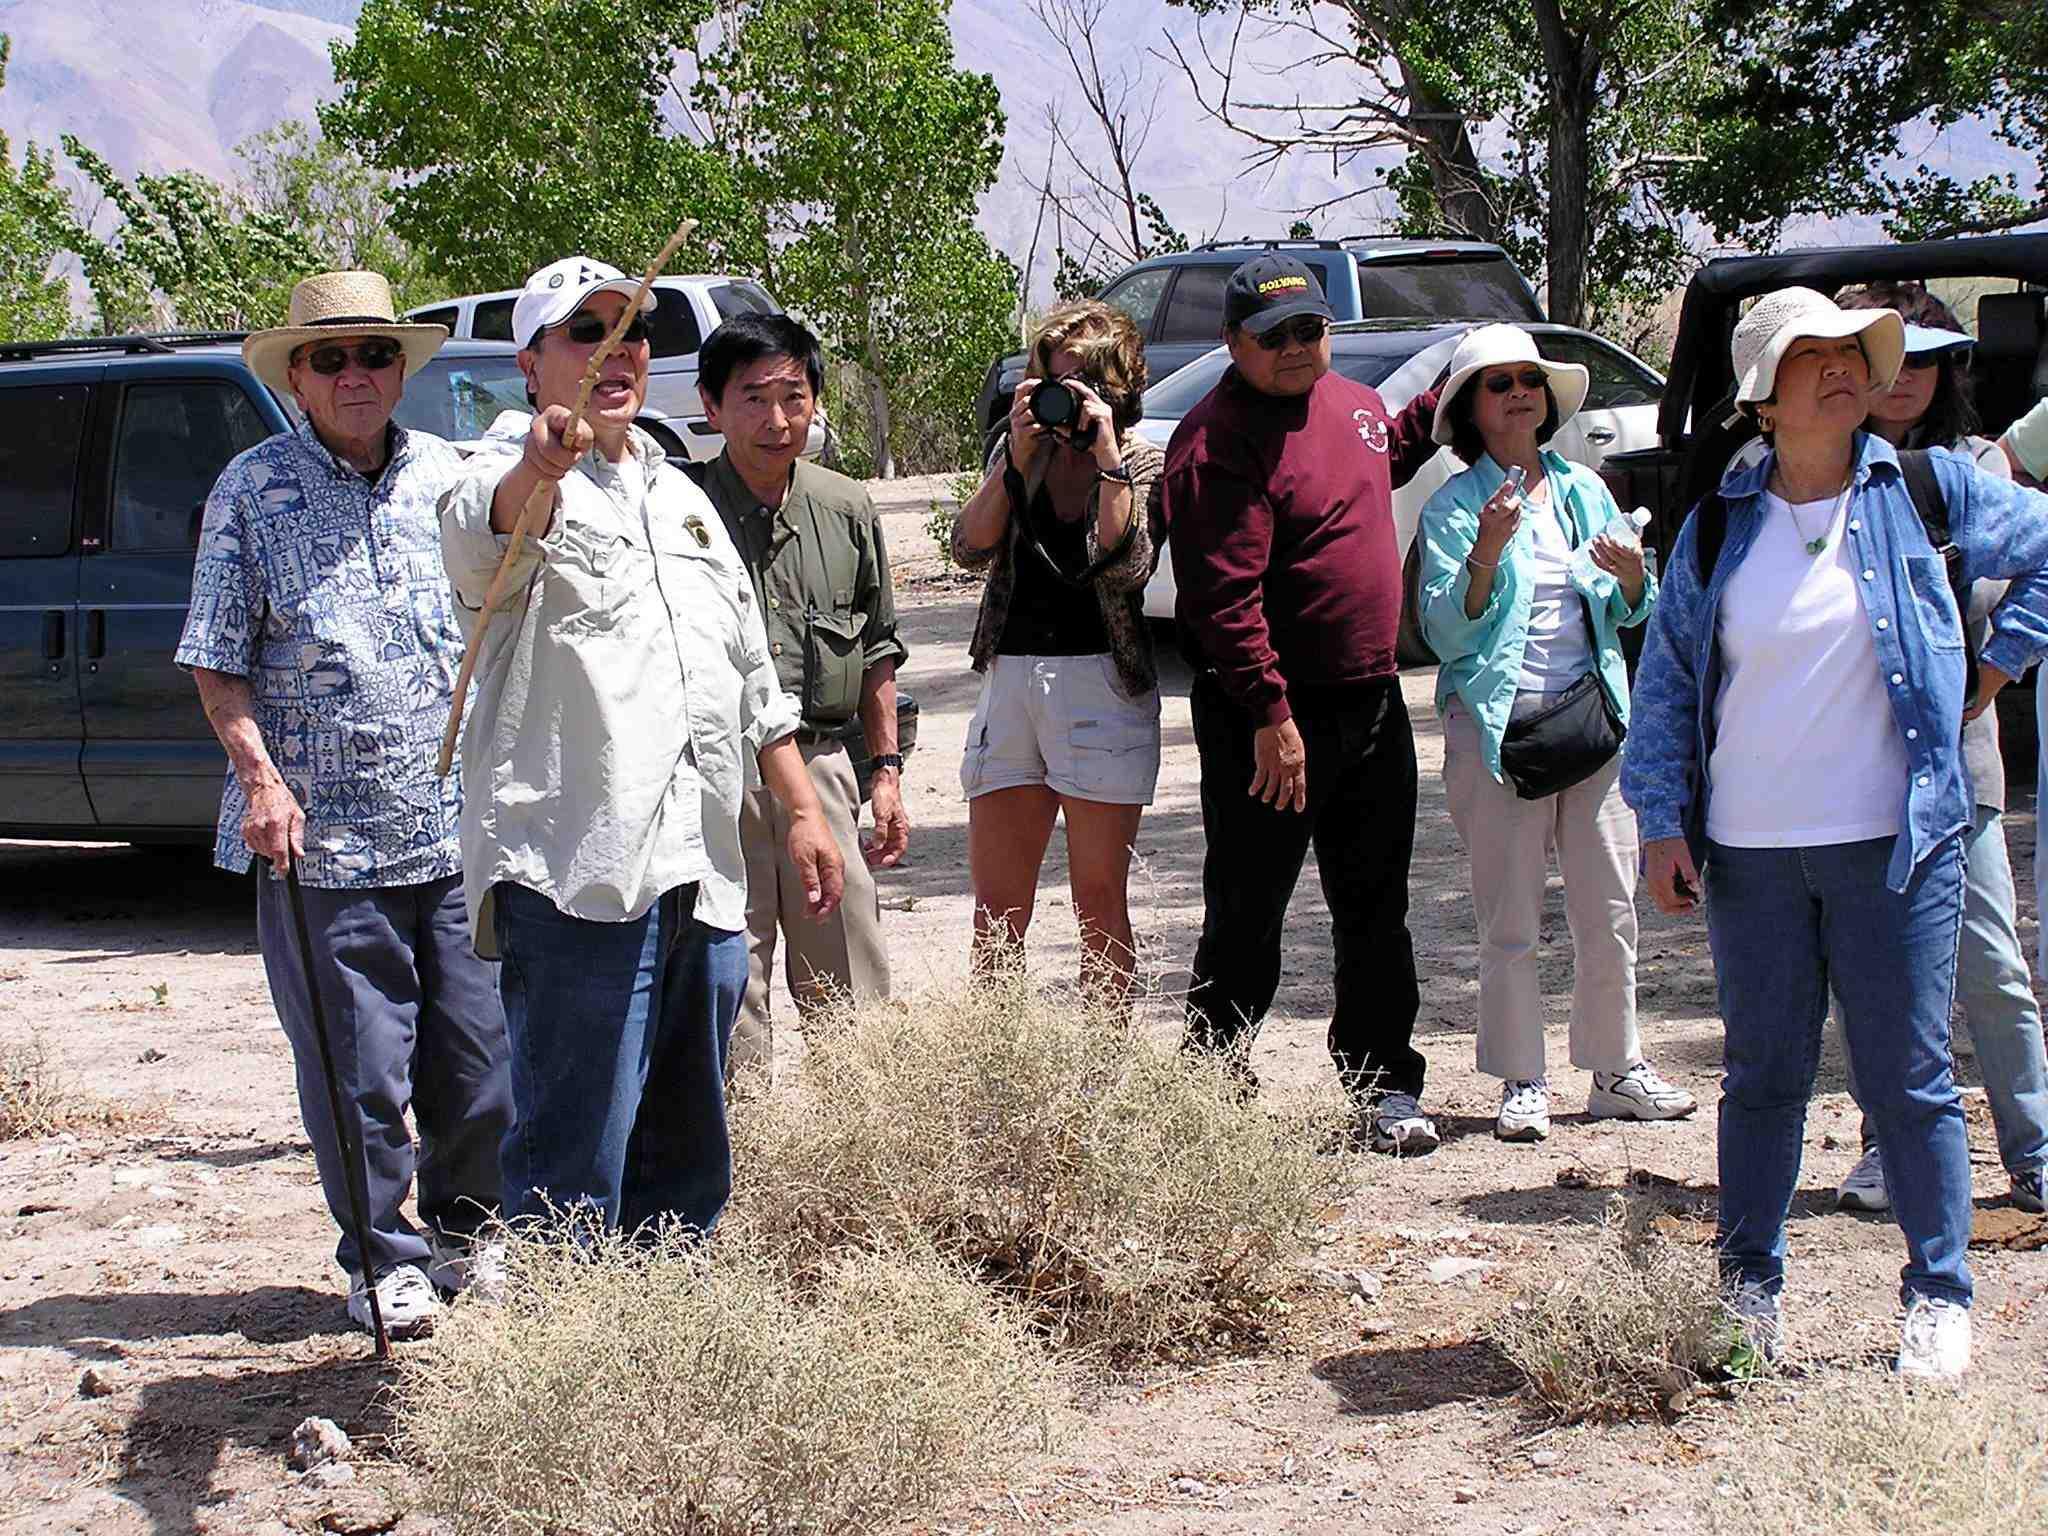 Manzanar weekend for National fishing association